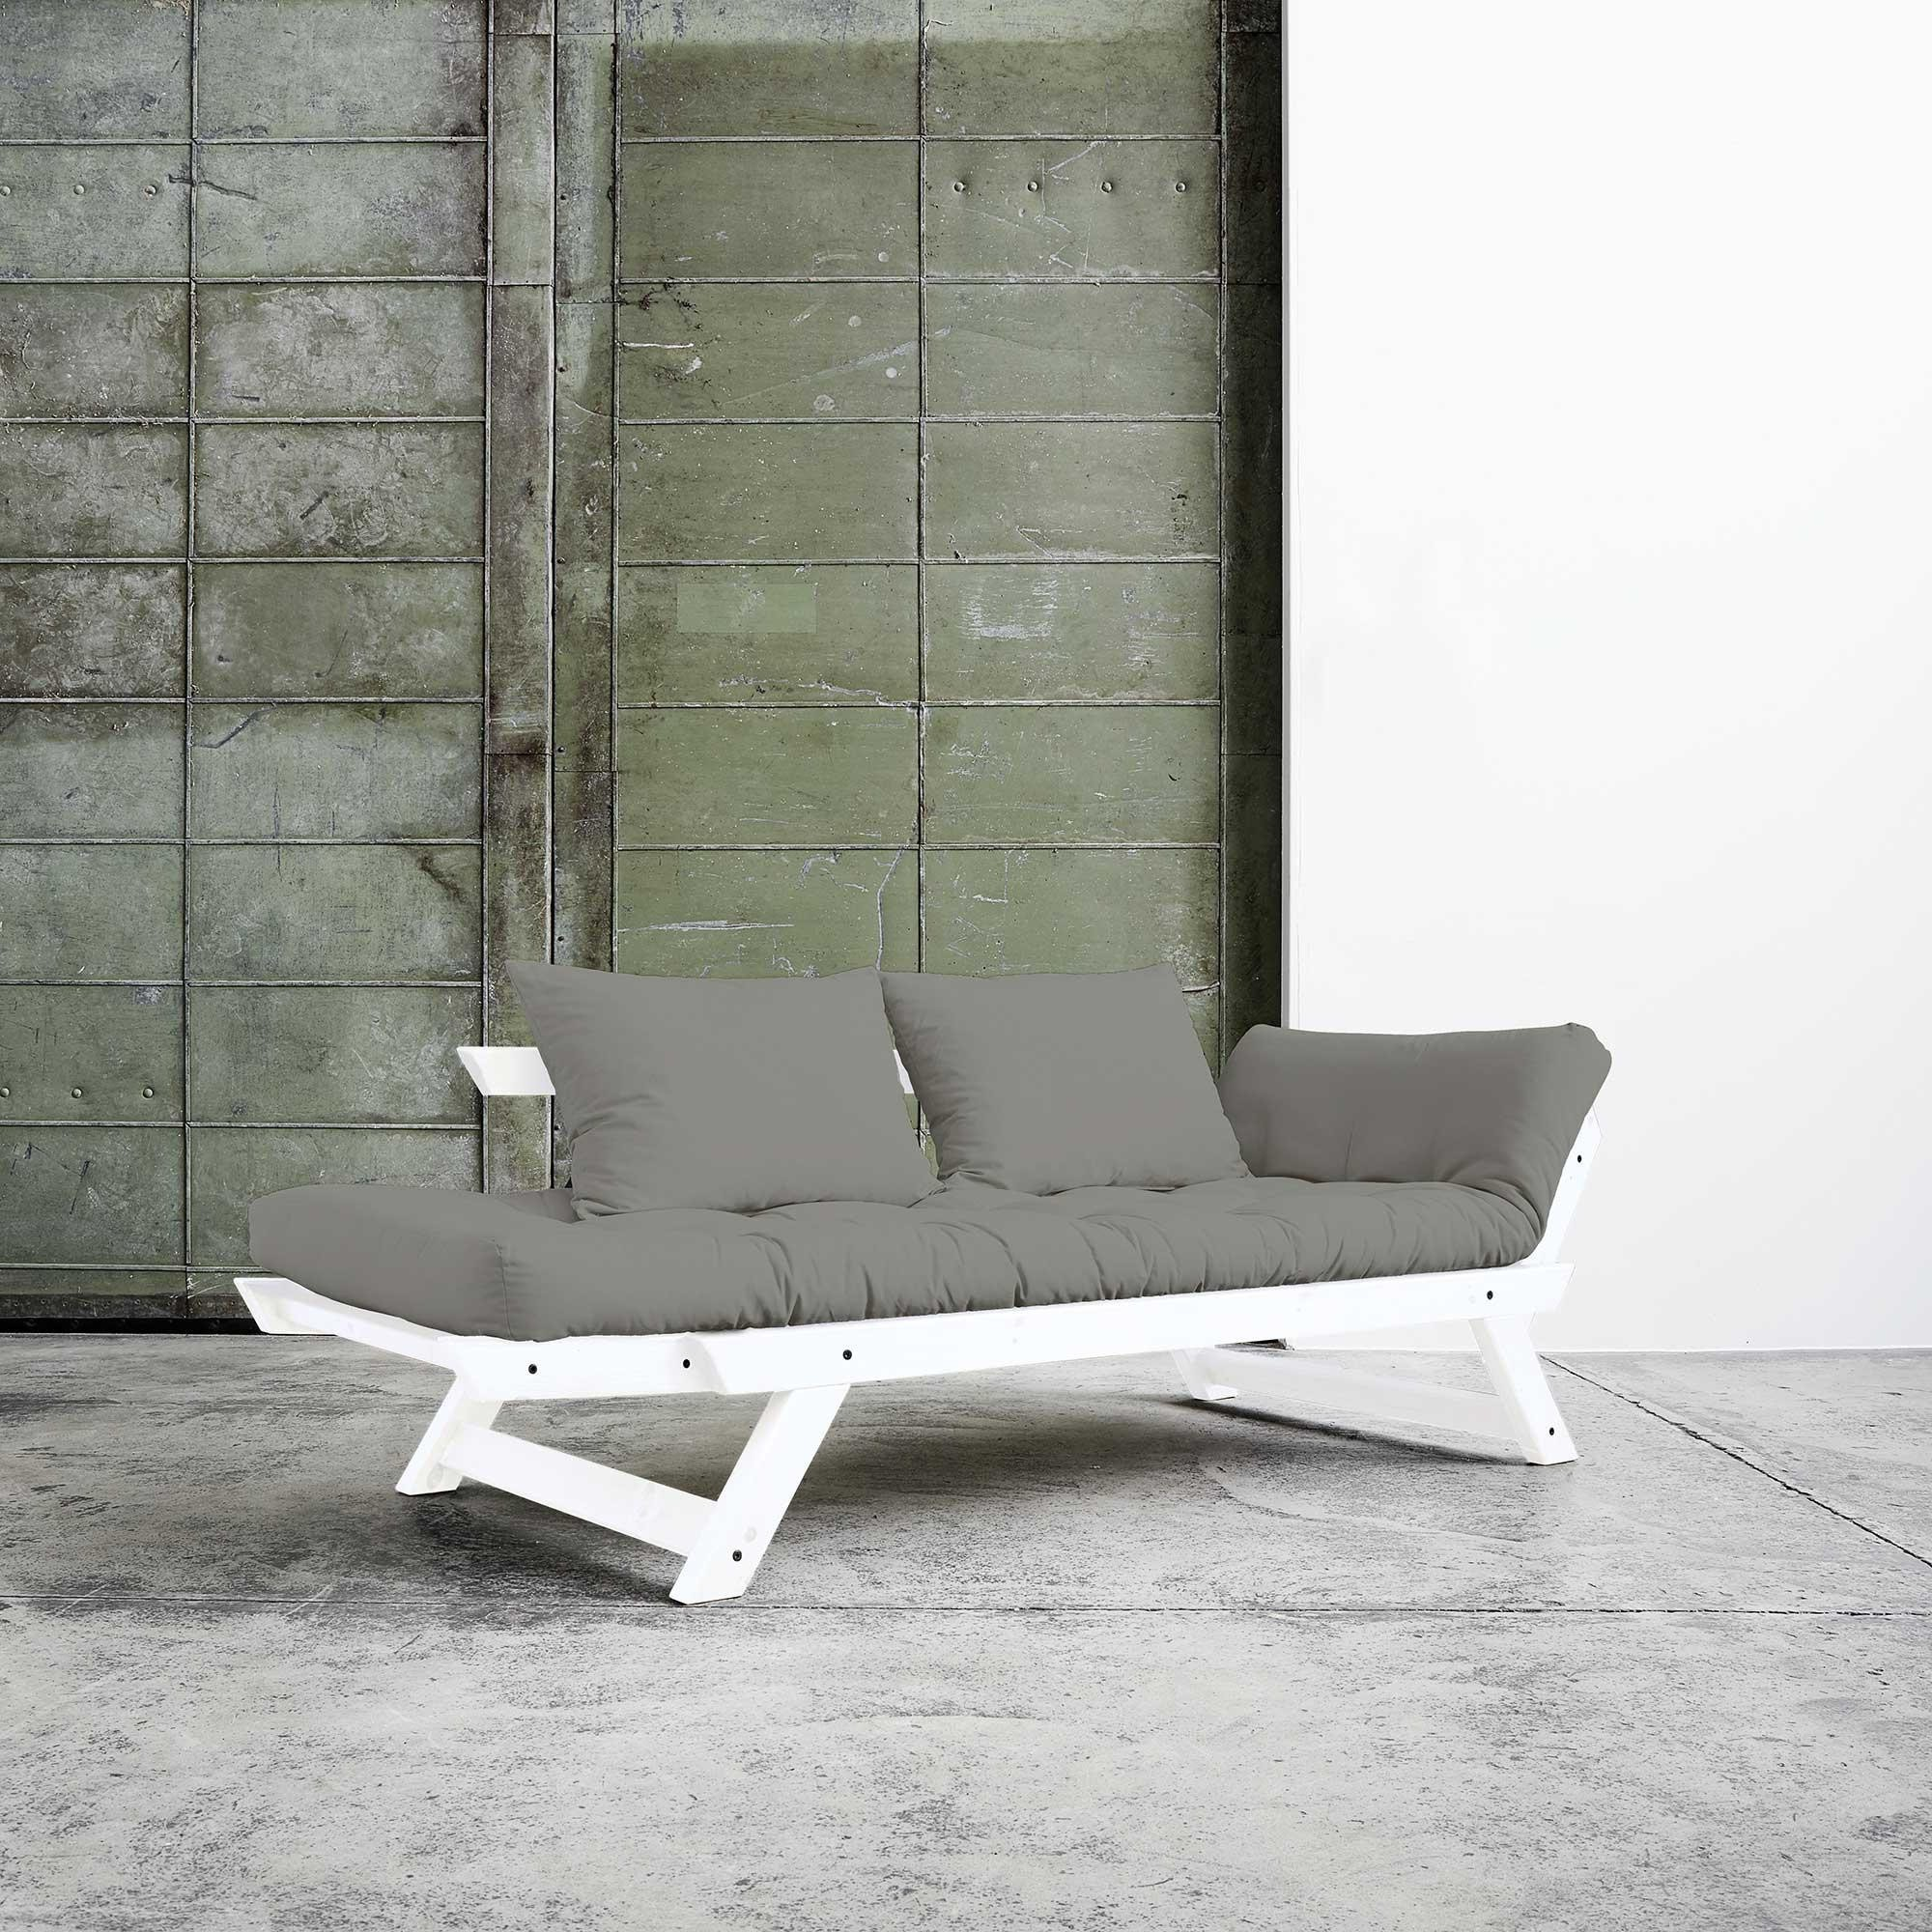 karup bebop sofa bed white laquered pine base ambientedirect rh ambientedirect com